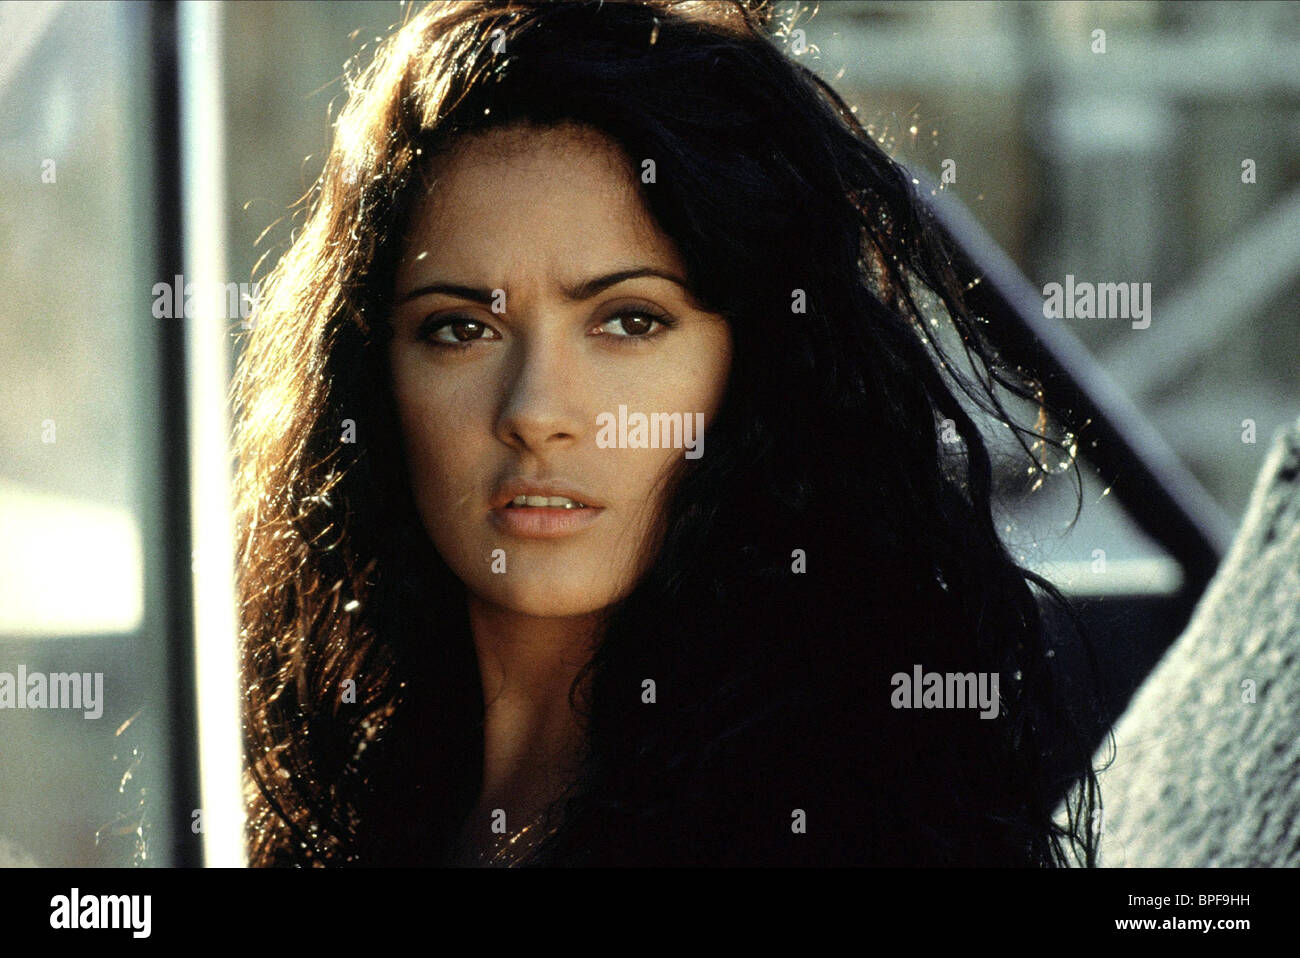 SALMA HAYEK DESPERADO (1995) - Stock Image